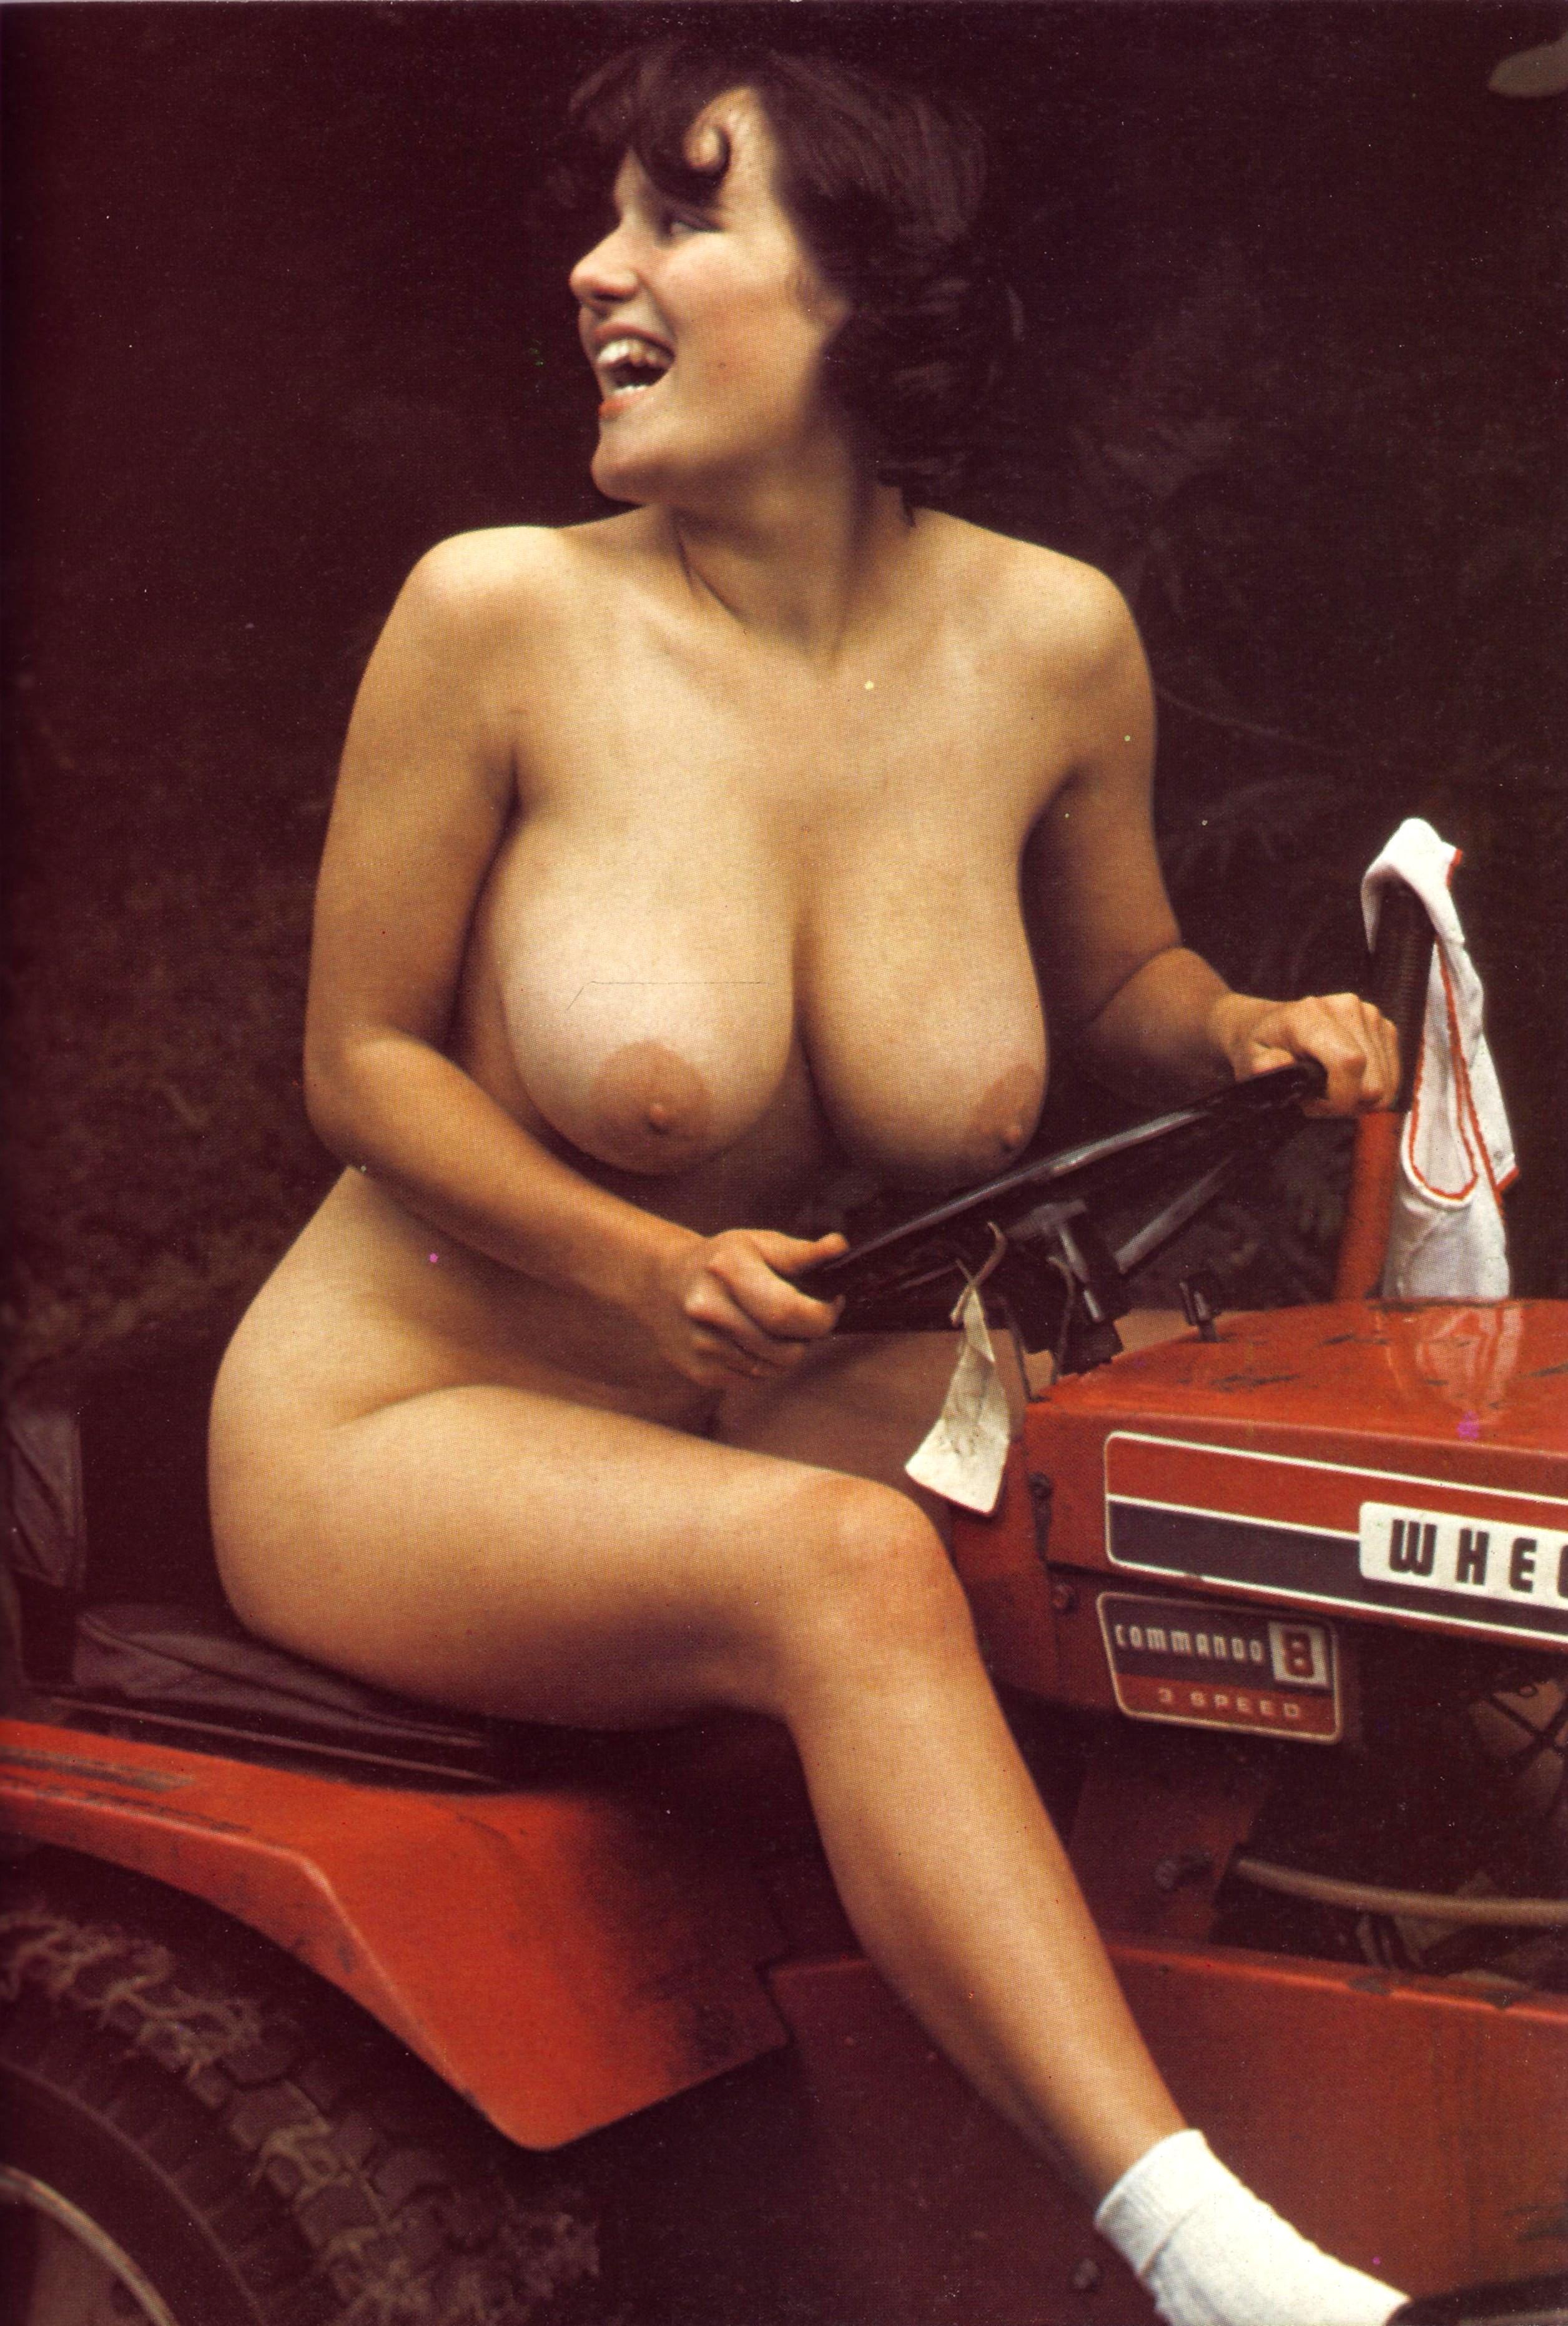 photos Vintage nude women